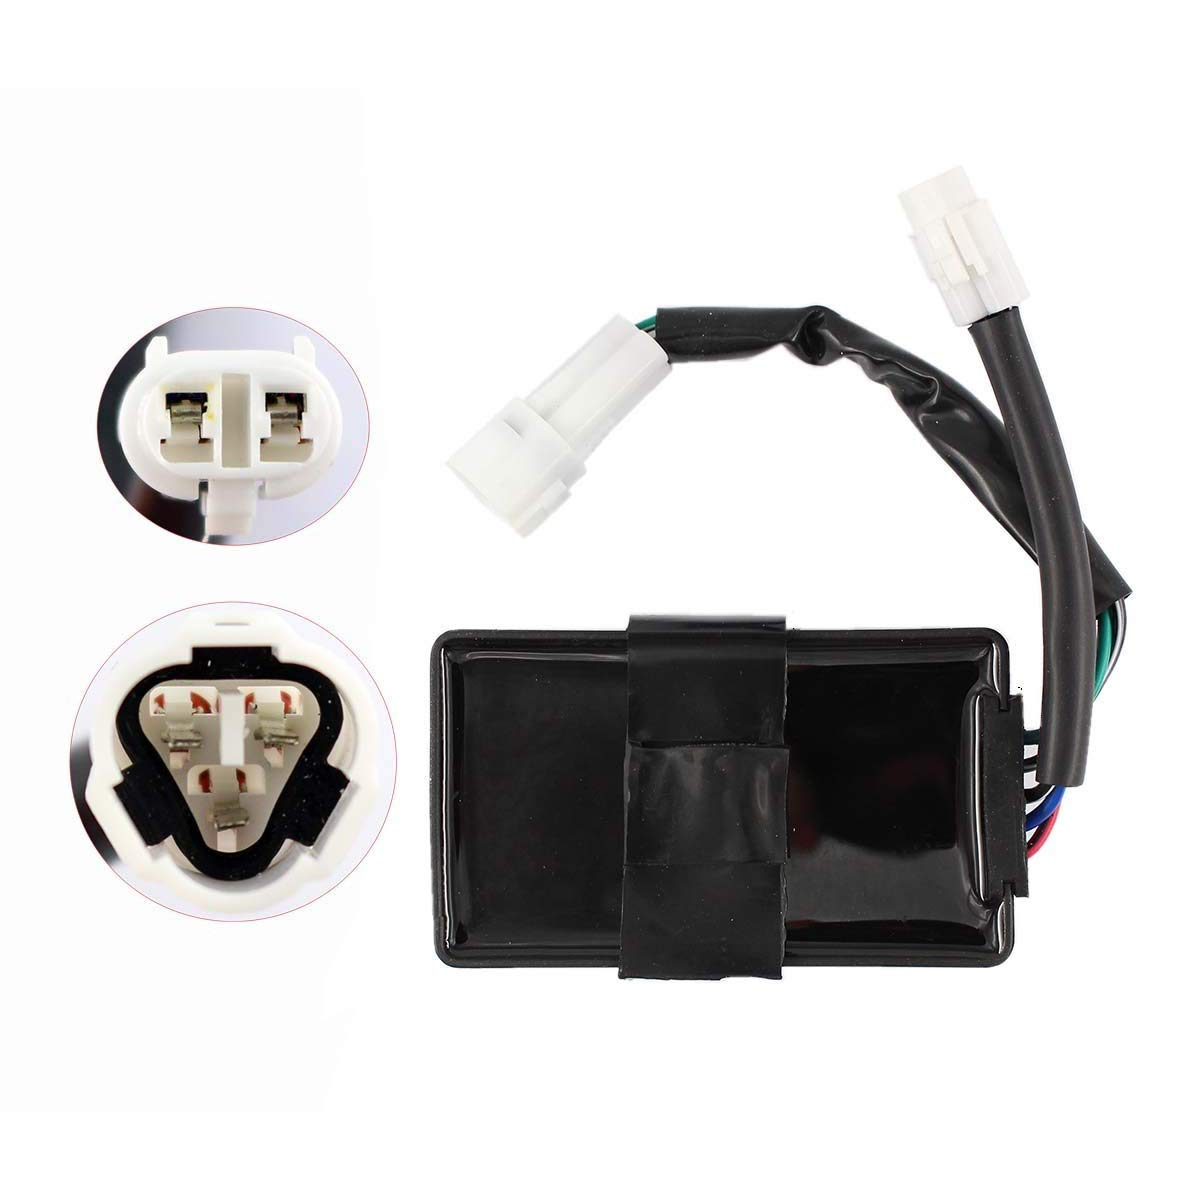 CDI Box Unit Ignitor Fits for Kawasaki ATV KLF300B KLF300C KEF300A KEF300B Replace #21119-1241, 21119-1258, 21119-1302, 21119-1369 HAOCHENG